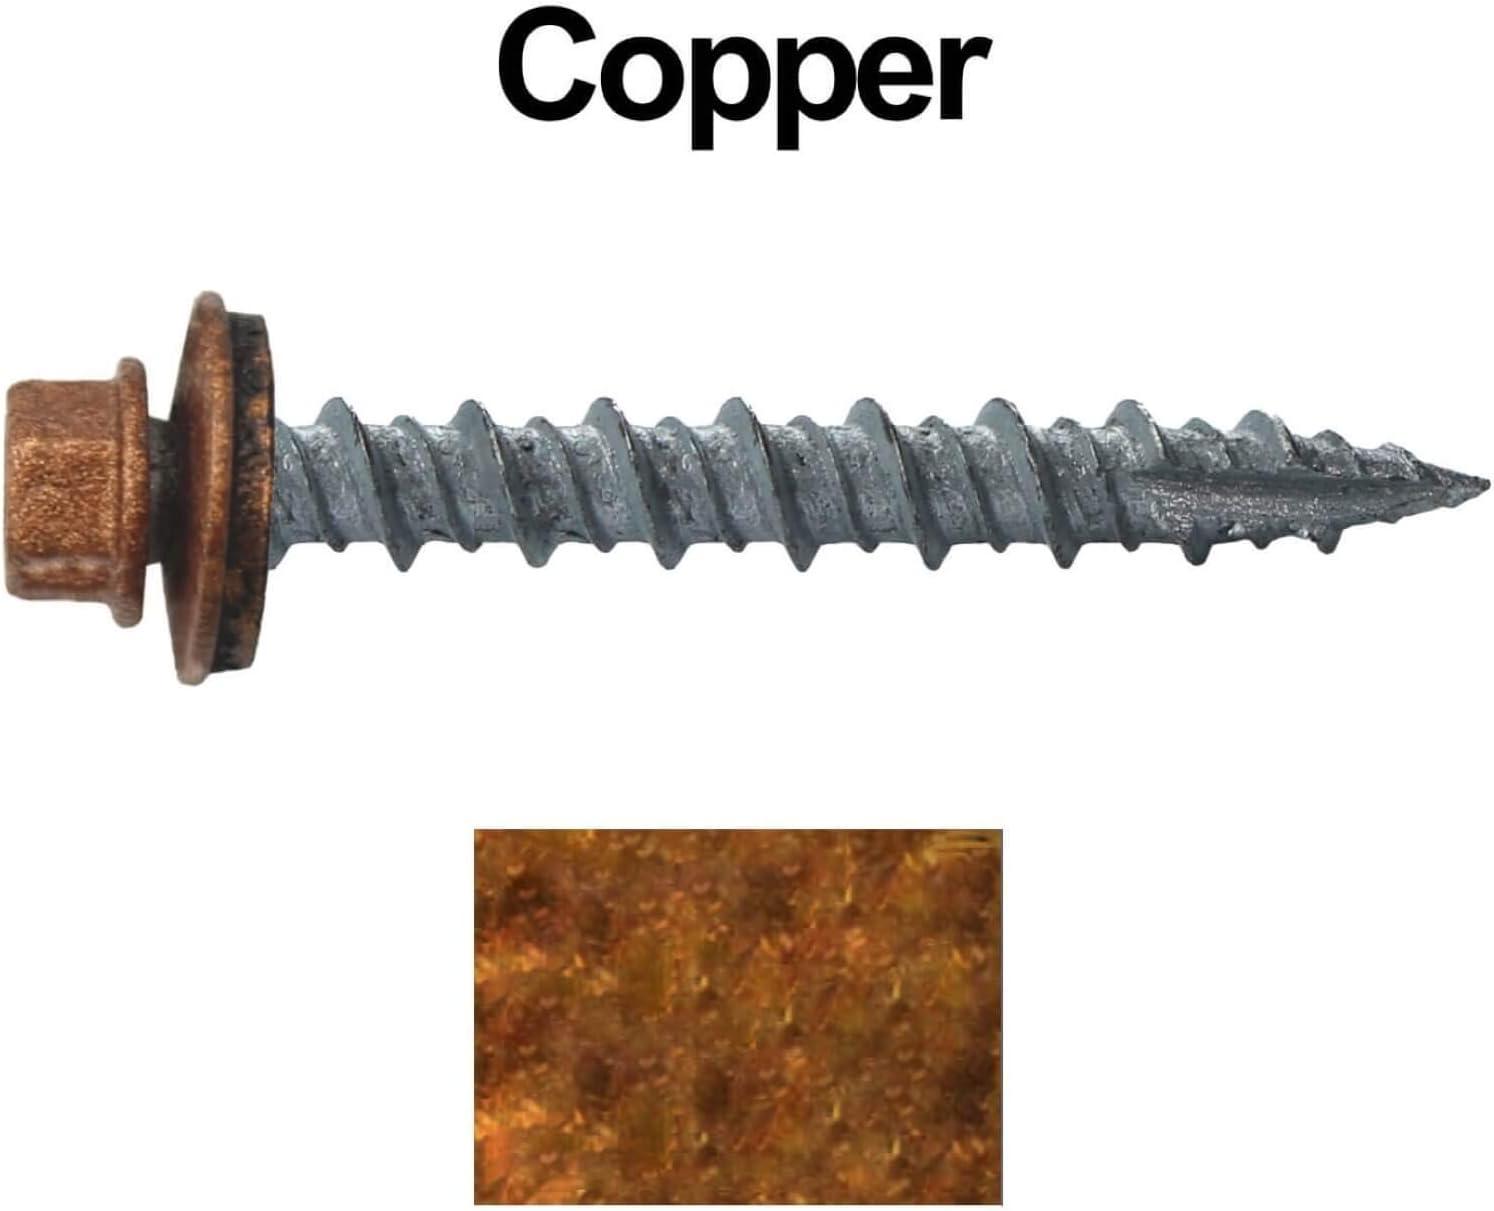 EPDM Washer 10 x 1-1//2/ Galvanized Hex Head Sheet Metal Roof Screw 250 Self Starting Metal to Wood siding Screws Metal Roofing Screws: No Paint